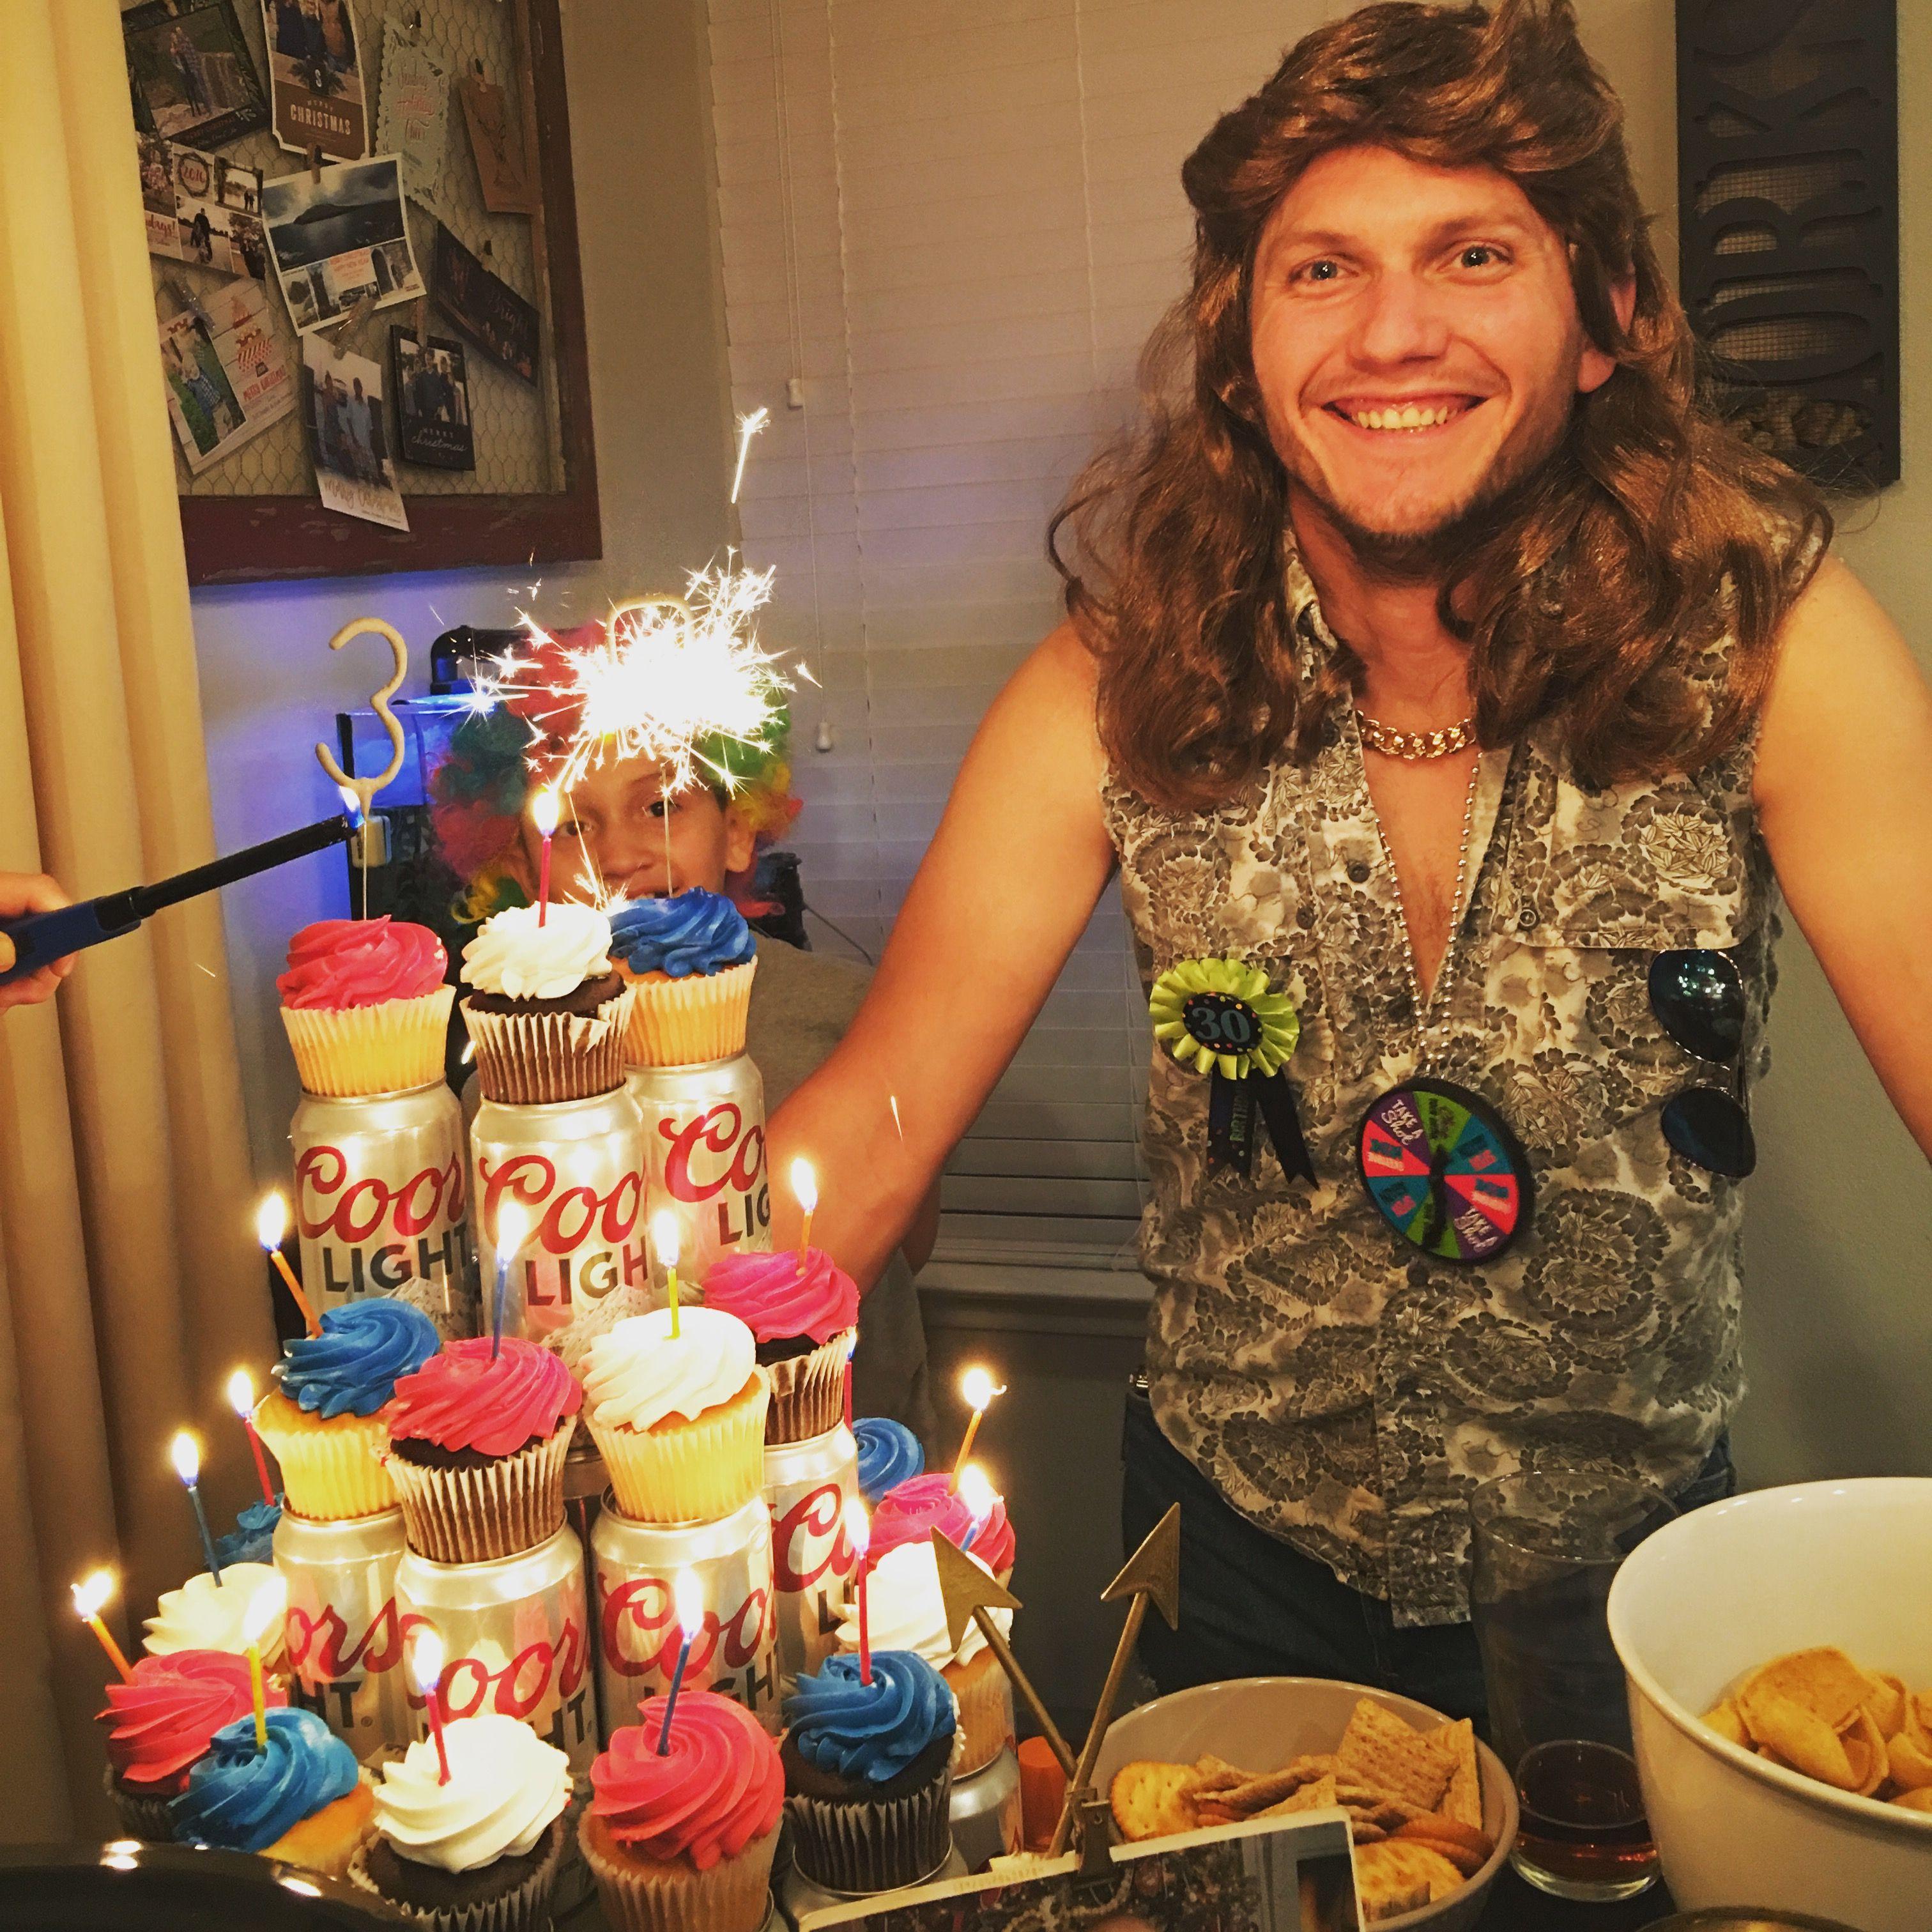 Beer Cake Beer Cupcakes Dirty Thirty Birthday White